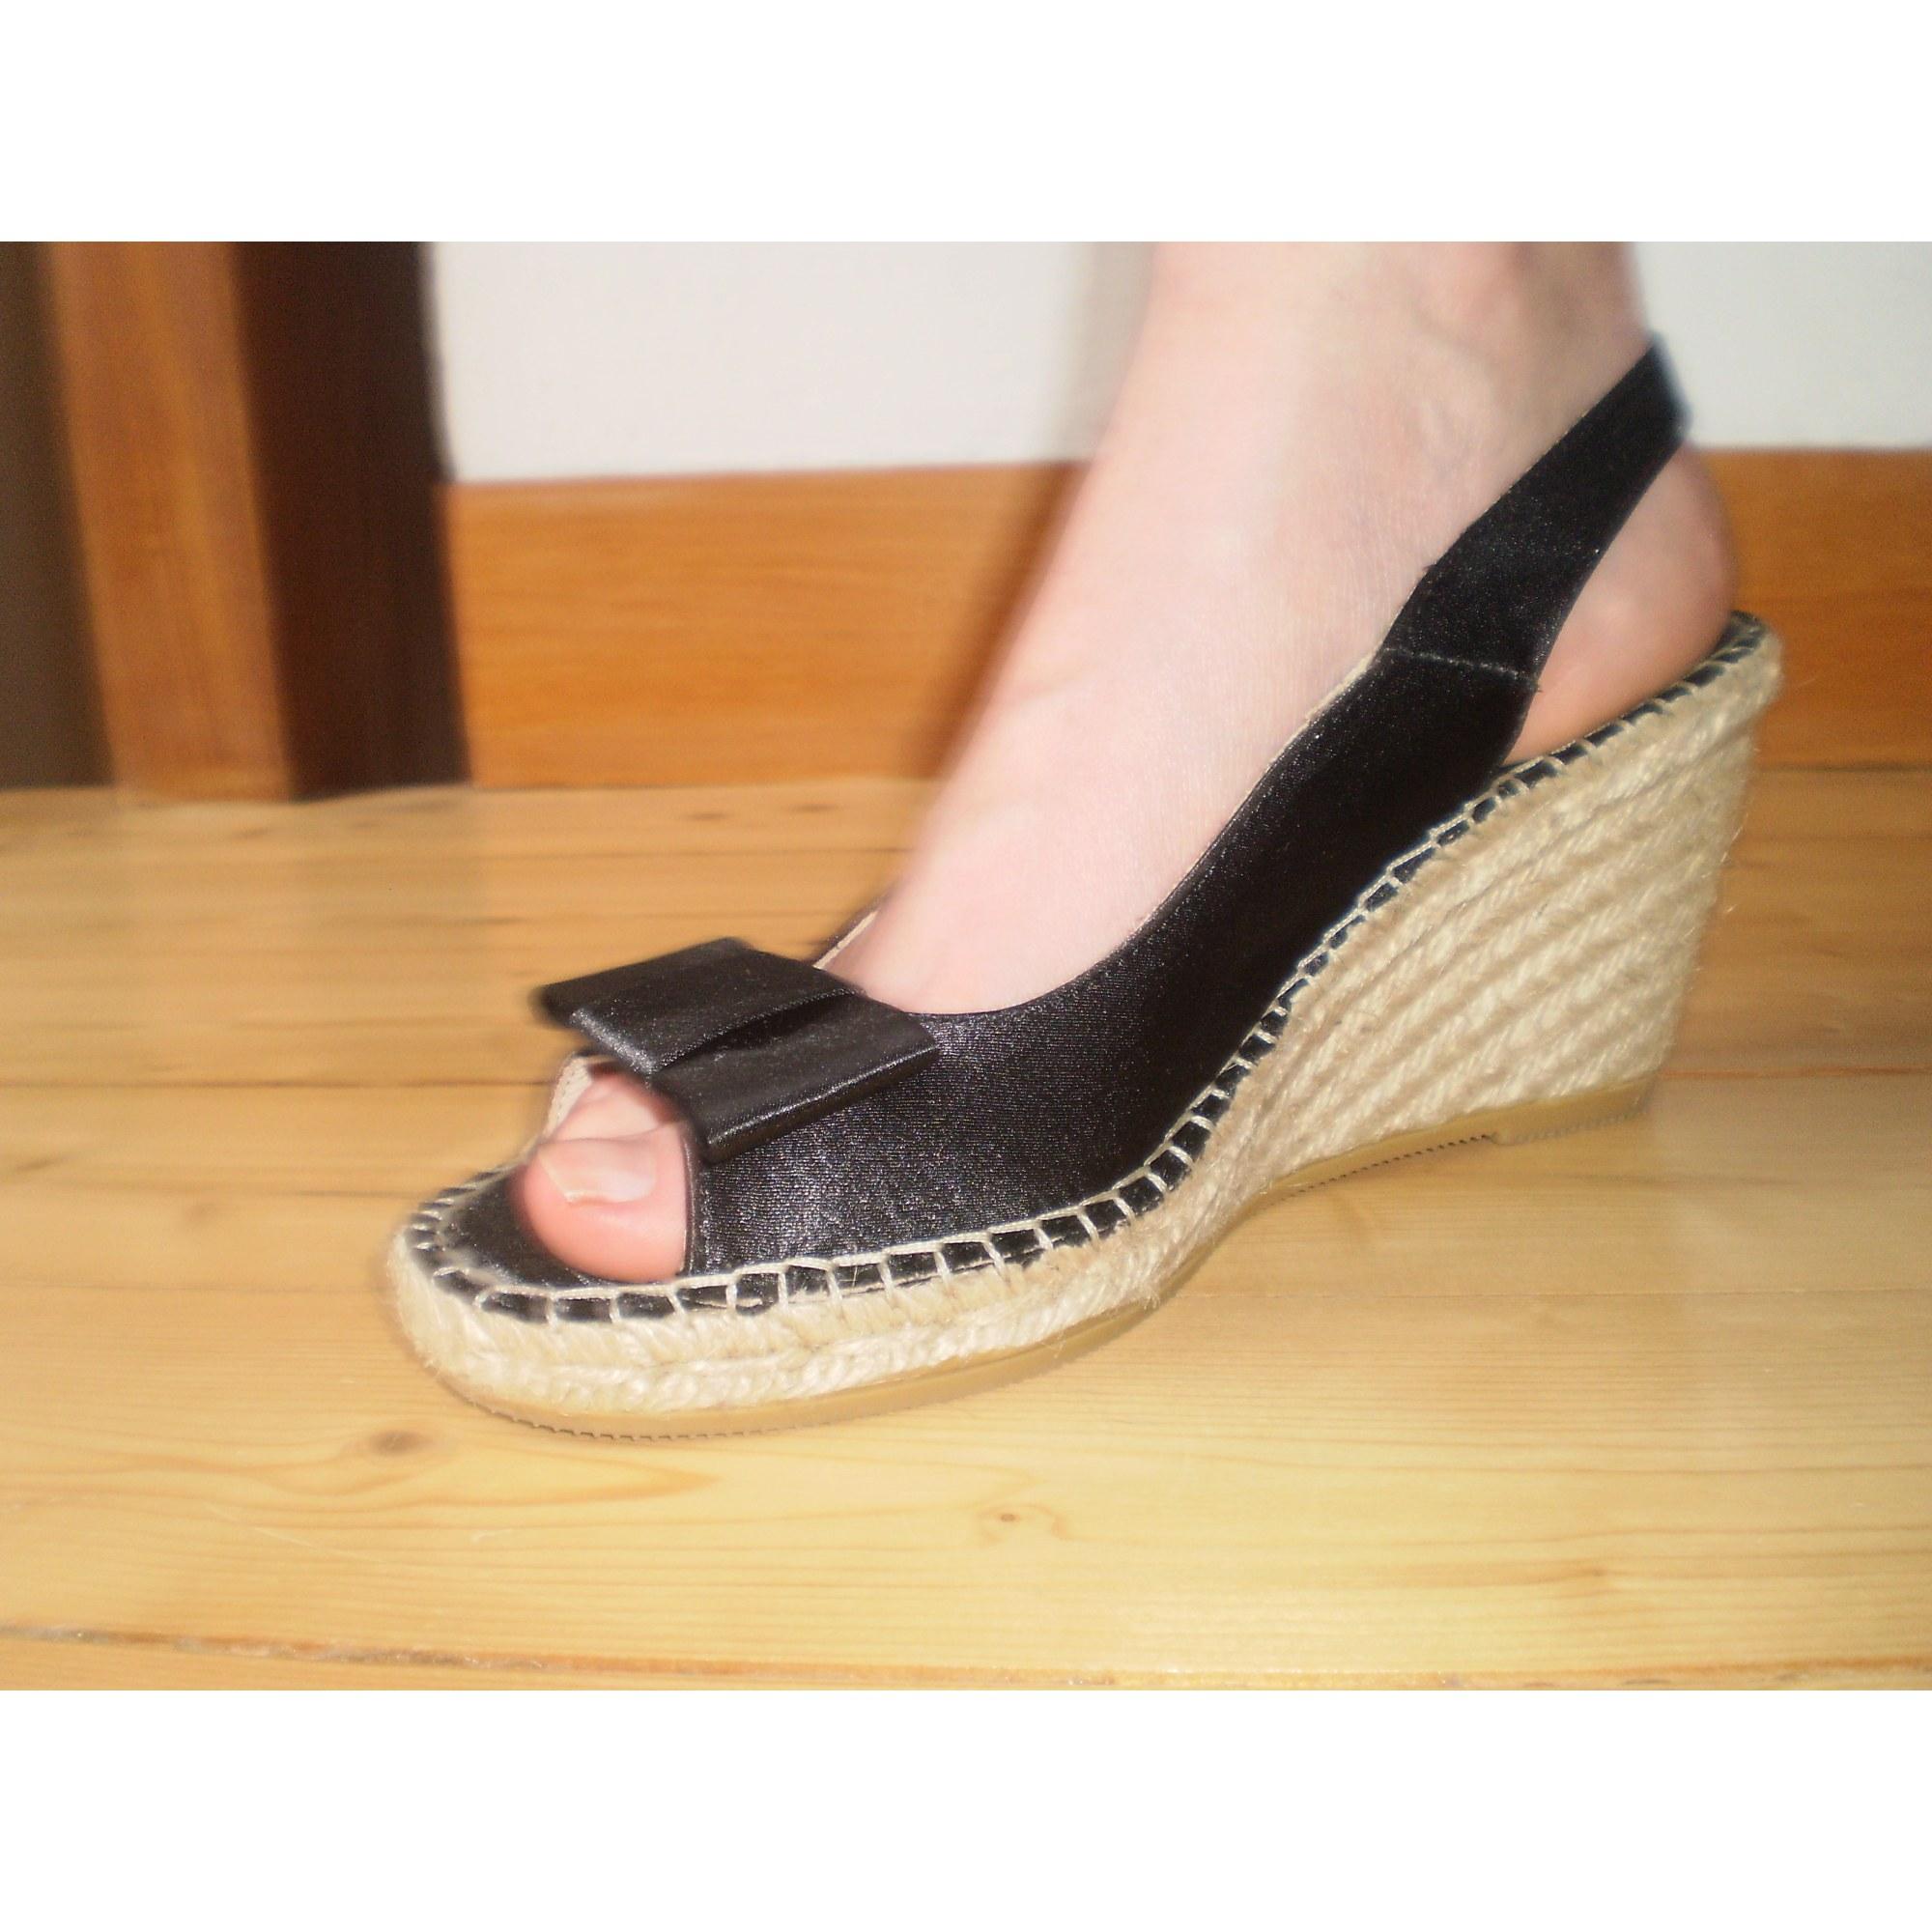 Femme Chaussures Femme Chaussures Compensées Compensées Chaussures Dunea Dunea Compensées Femme zpSMUV